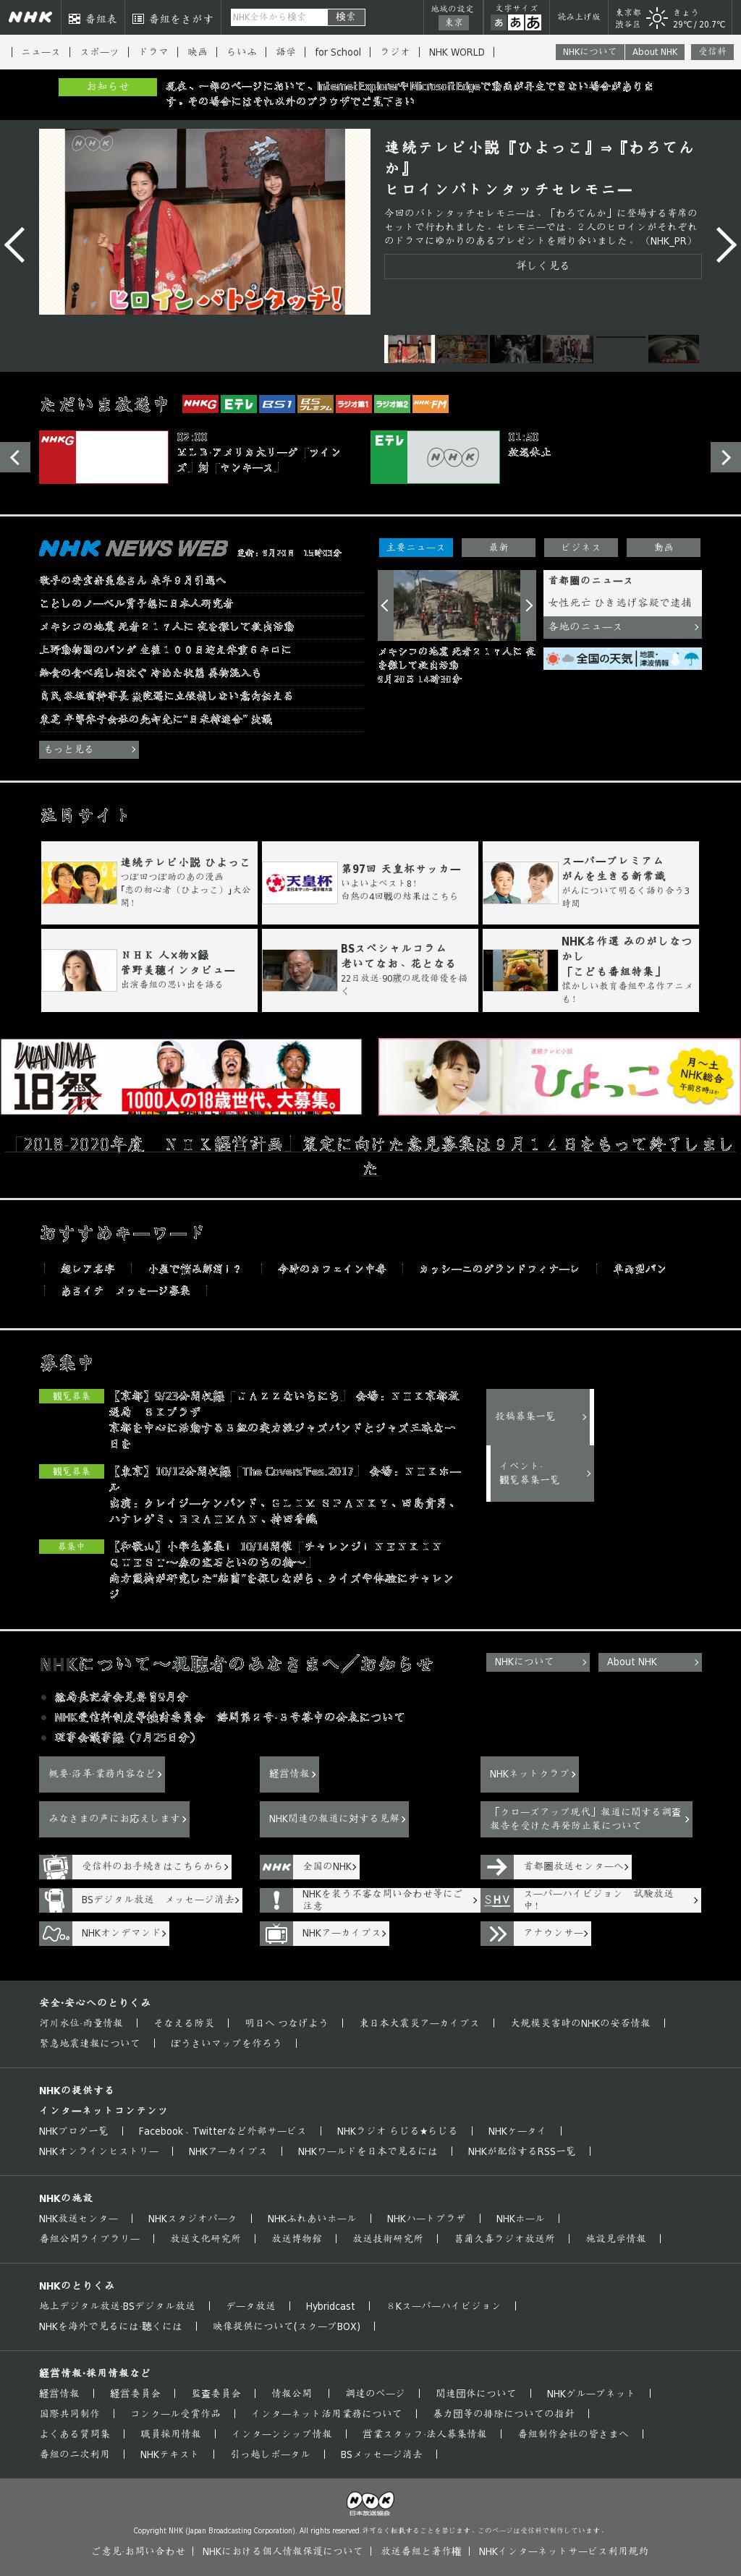 NHK Online at Wednesday Sept. 20, 2017, 6:13 p.m. UTC